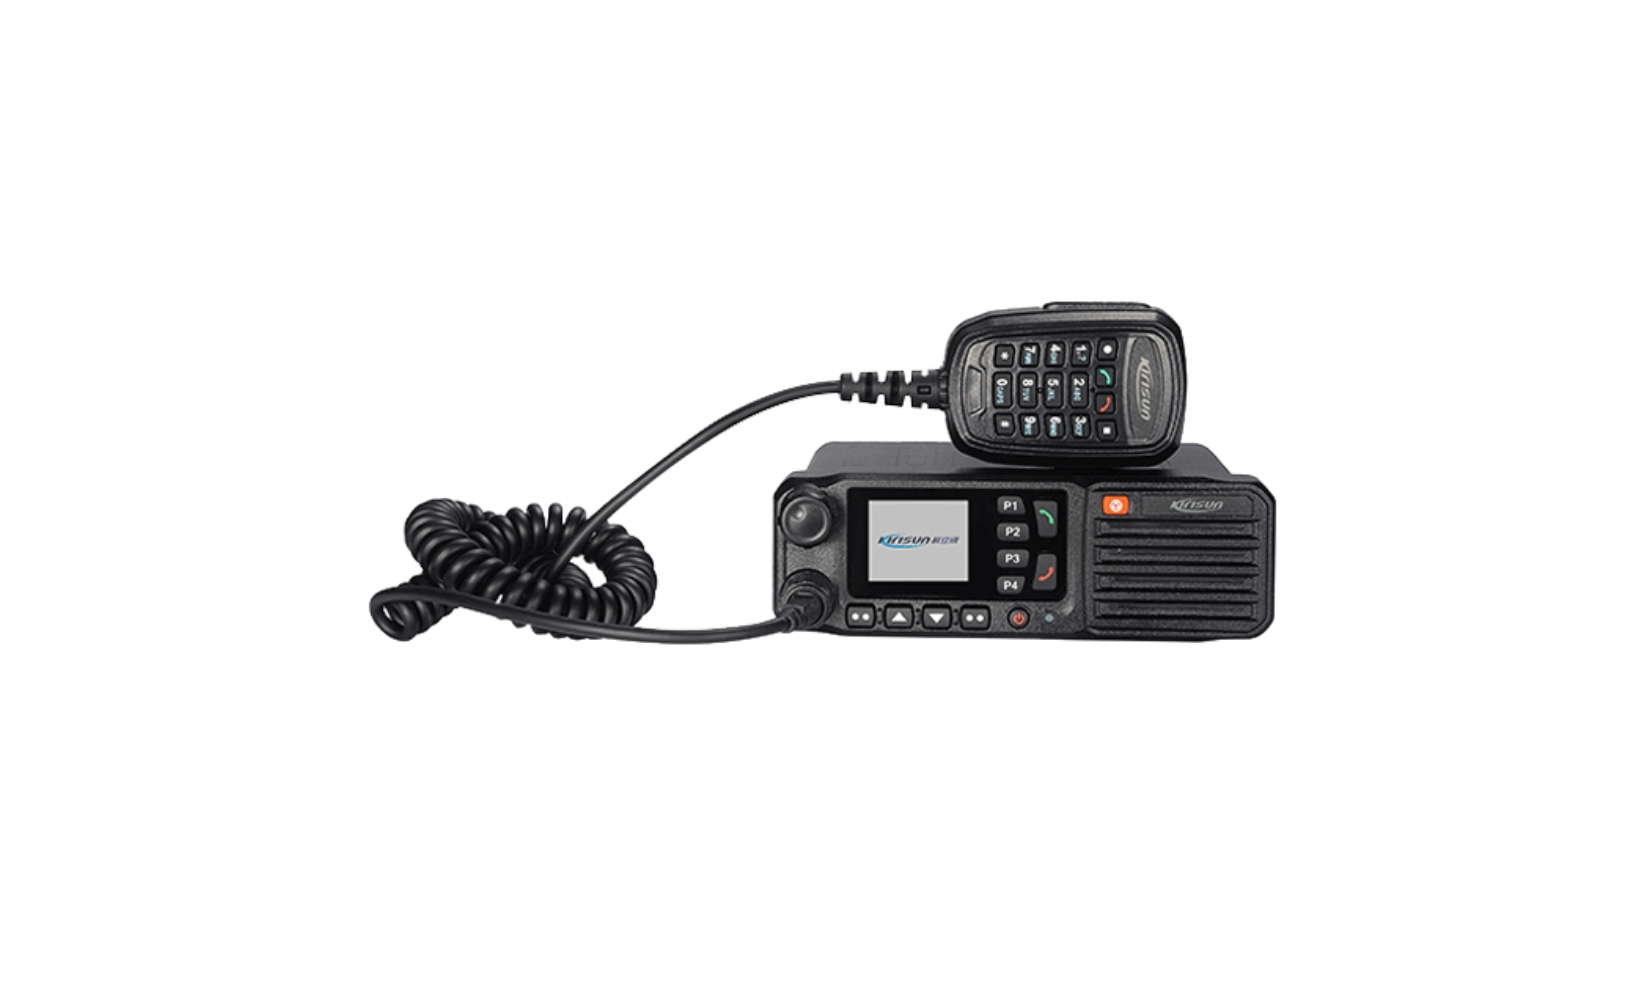 photo of TM-840-GPS-VHF-25 - 1024 Channel, 25 Watt, VHF Mobile Radio